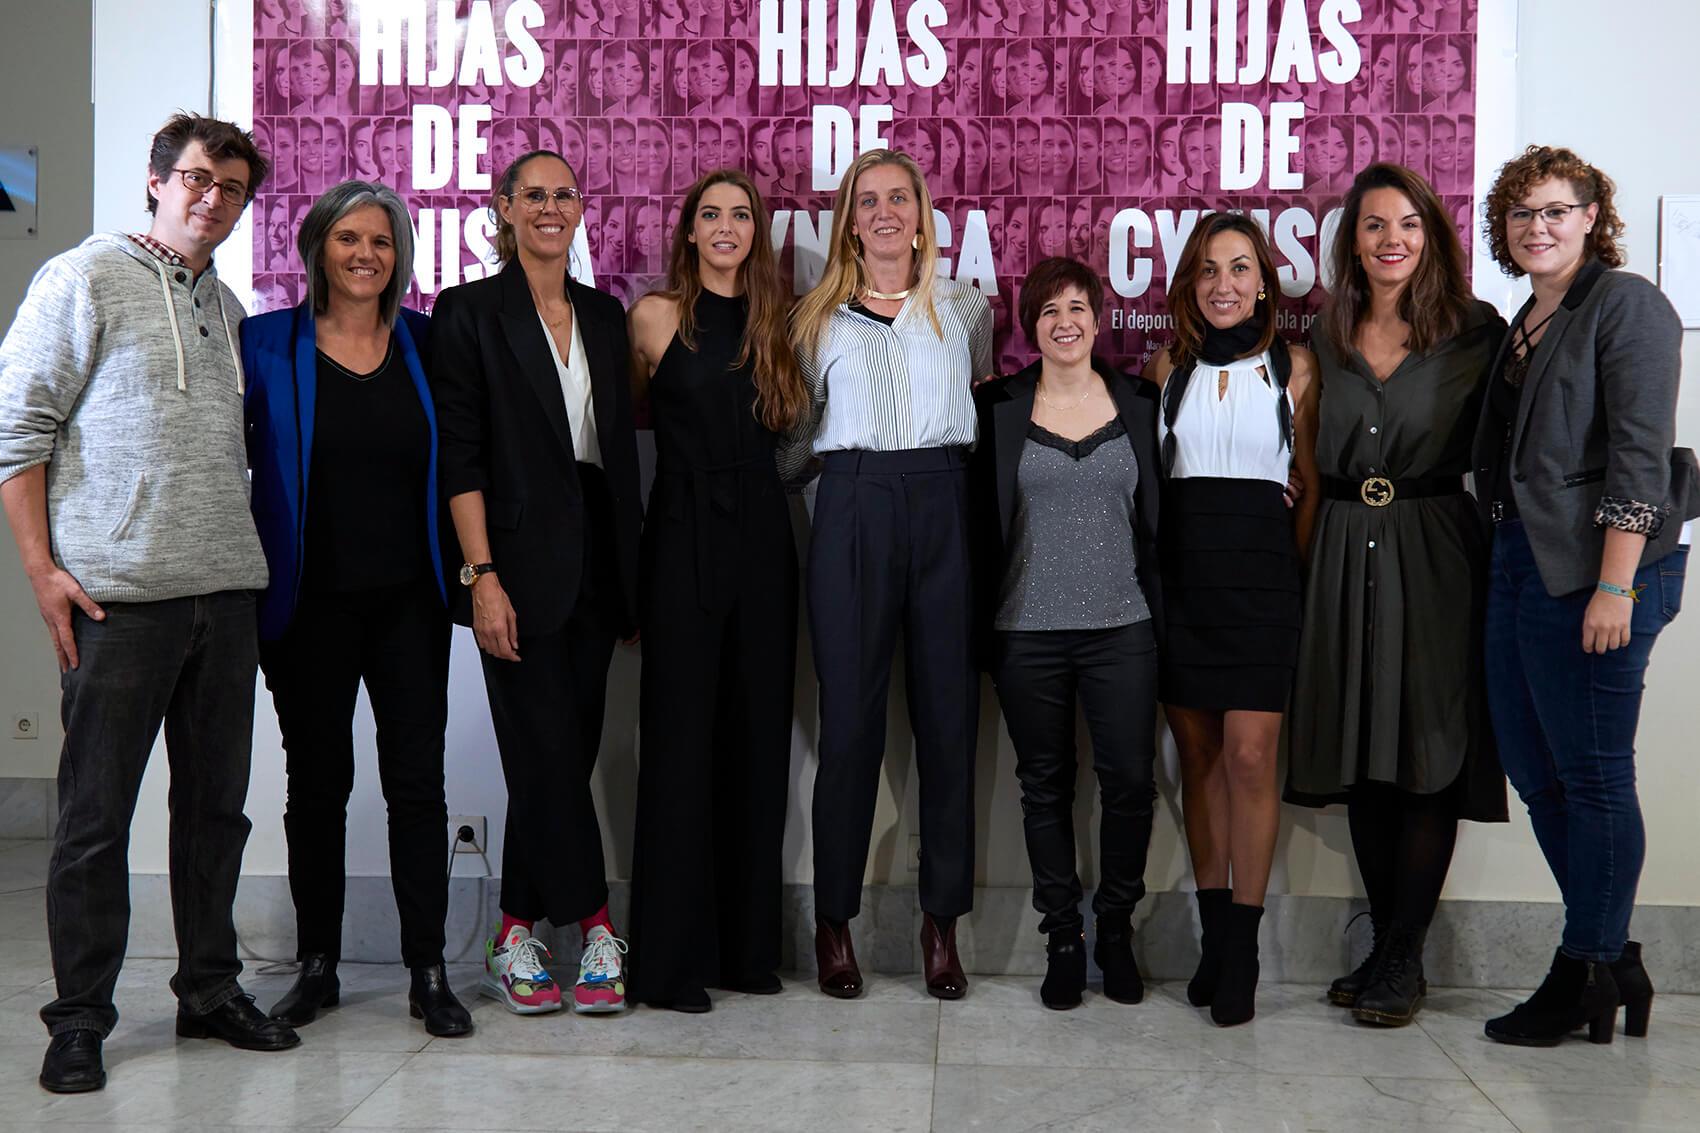 Eugenio Tardón, Laura Torvisco, Amaya Valdemoro, Mary Álvarez del Burgo, Paula Tirini, Beatriz Carretero, Dori Ruano, Bea Fernández y Beatriz Guerra